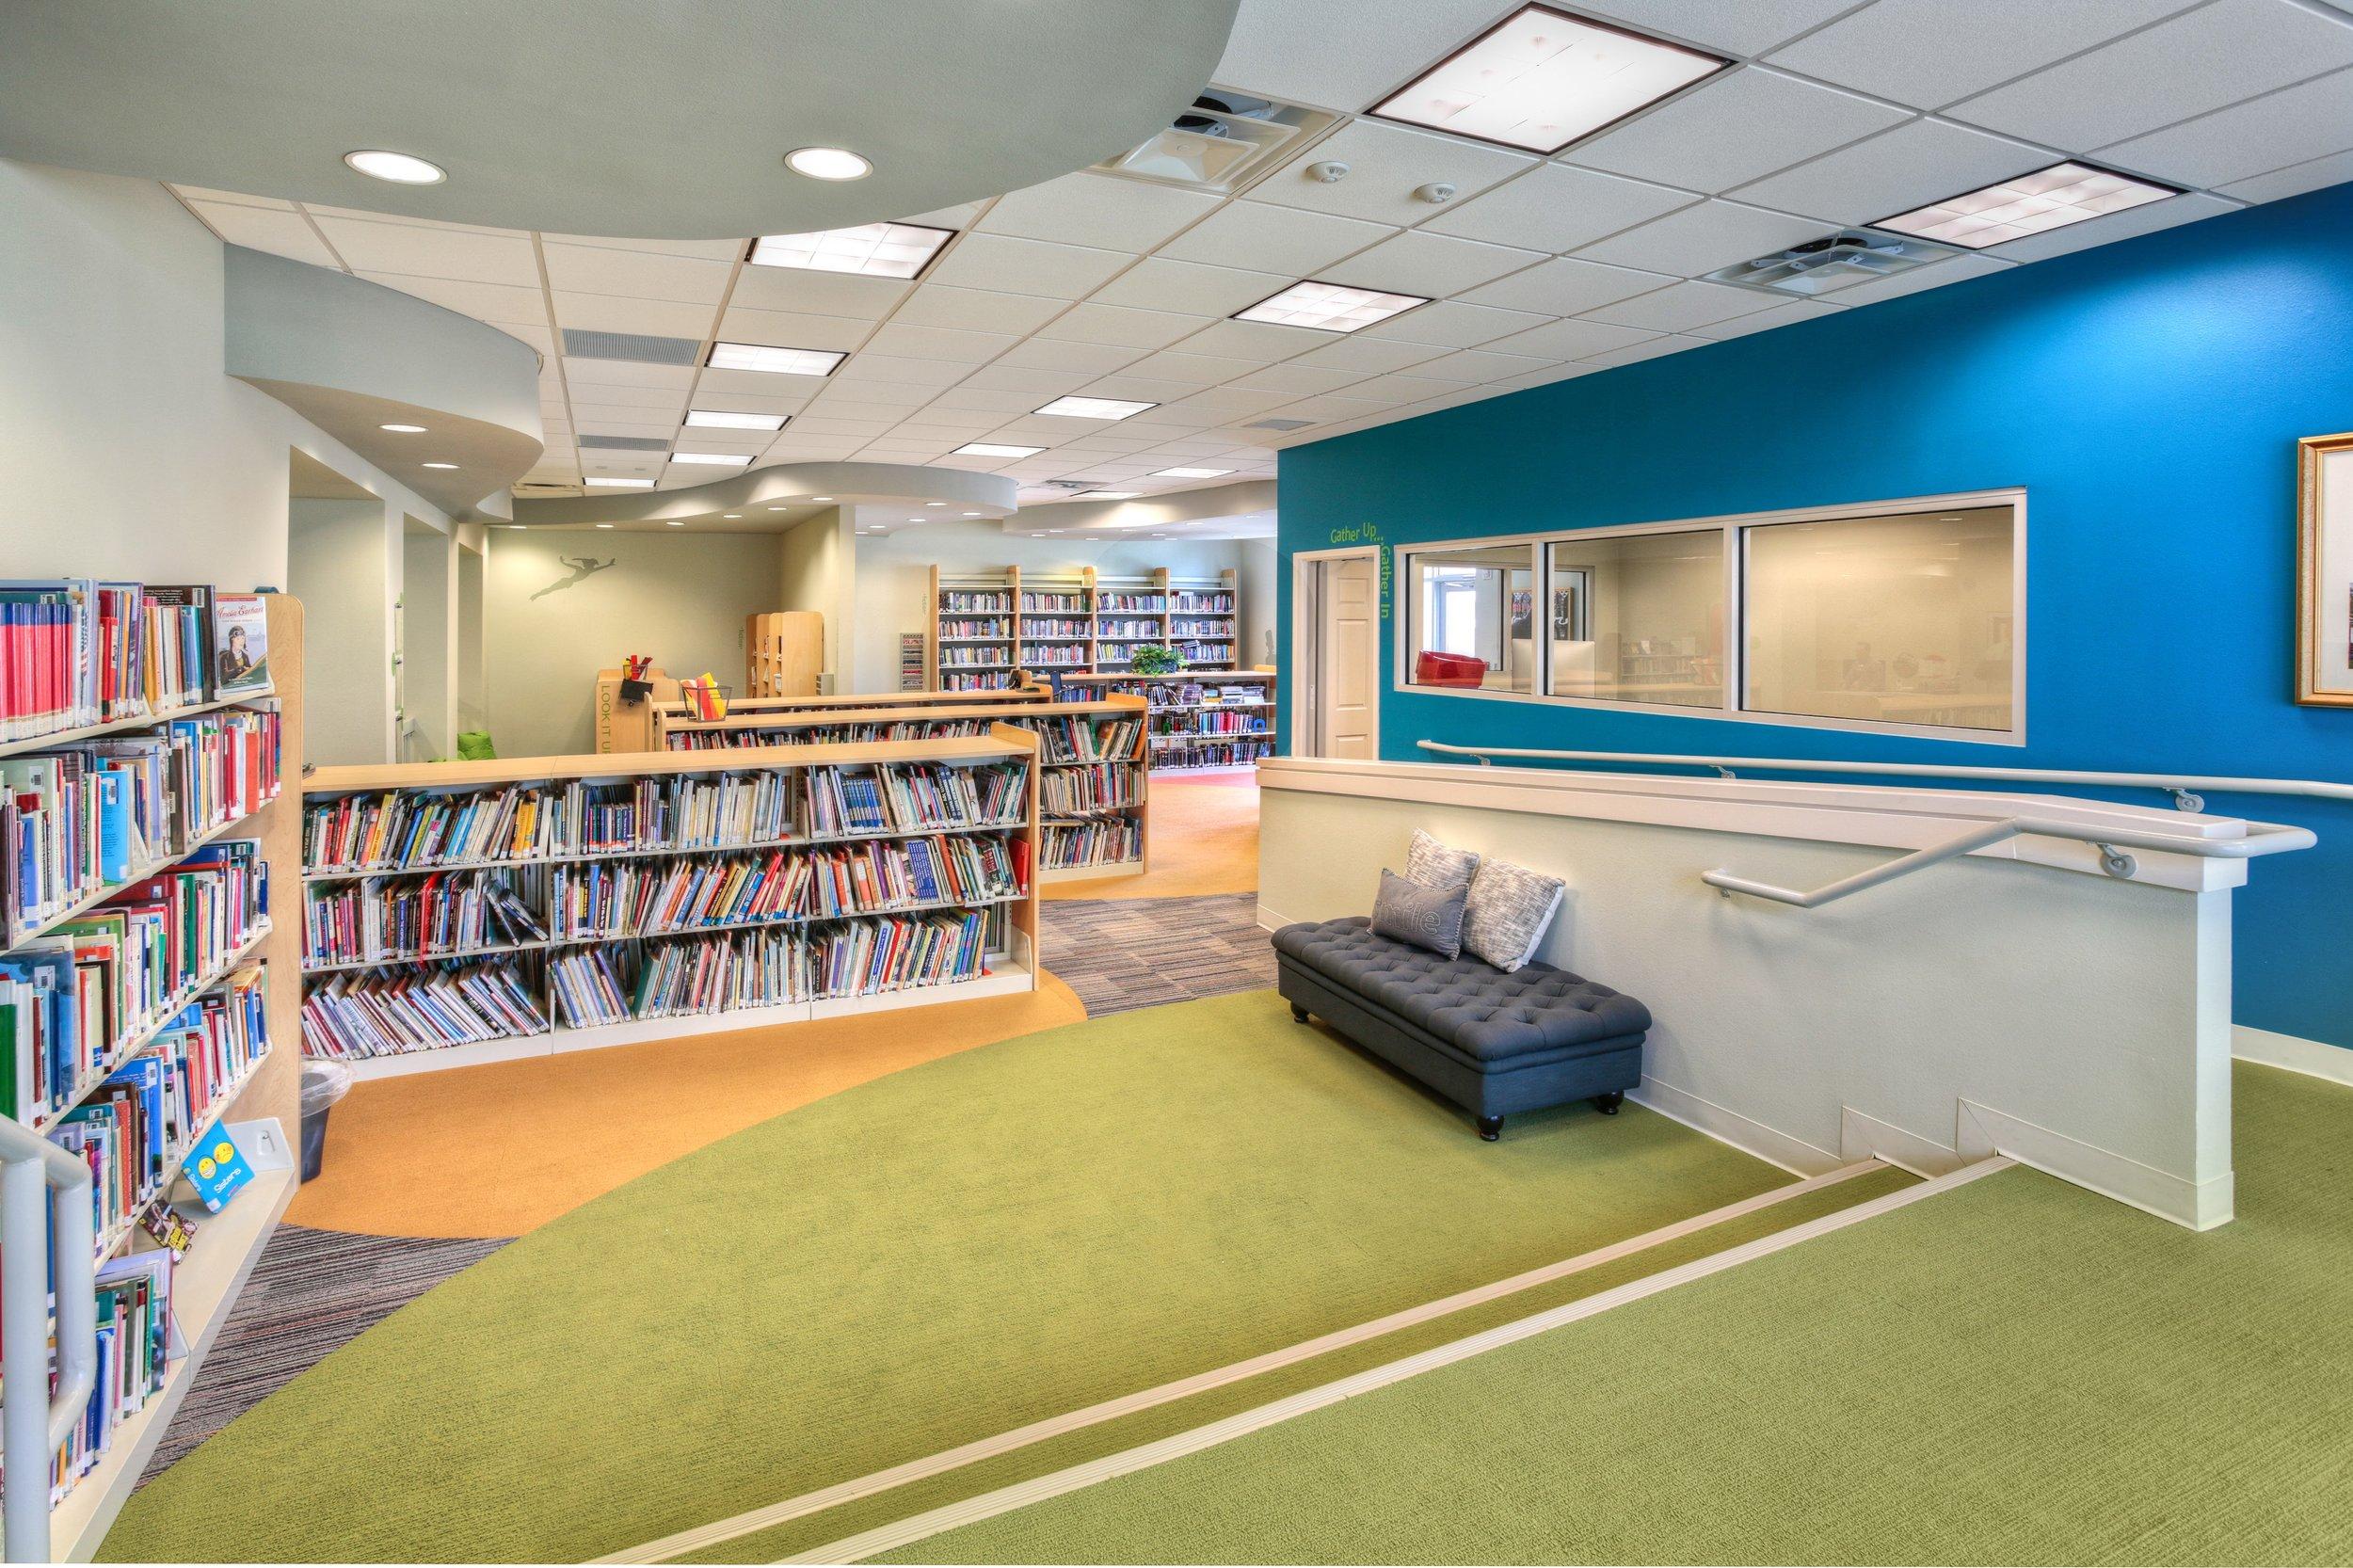 Library2.jpg